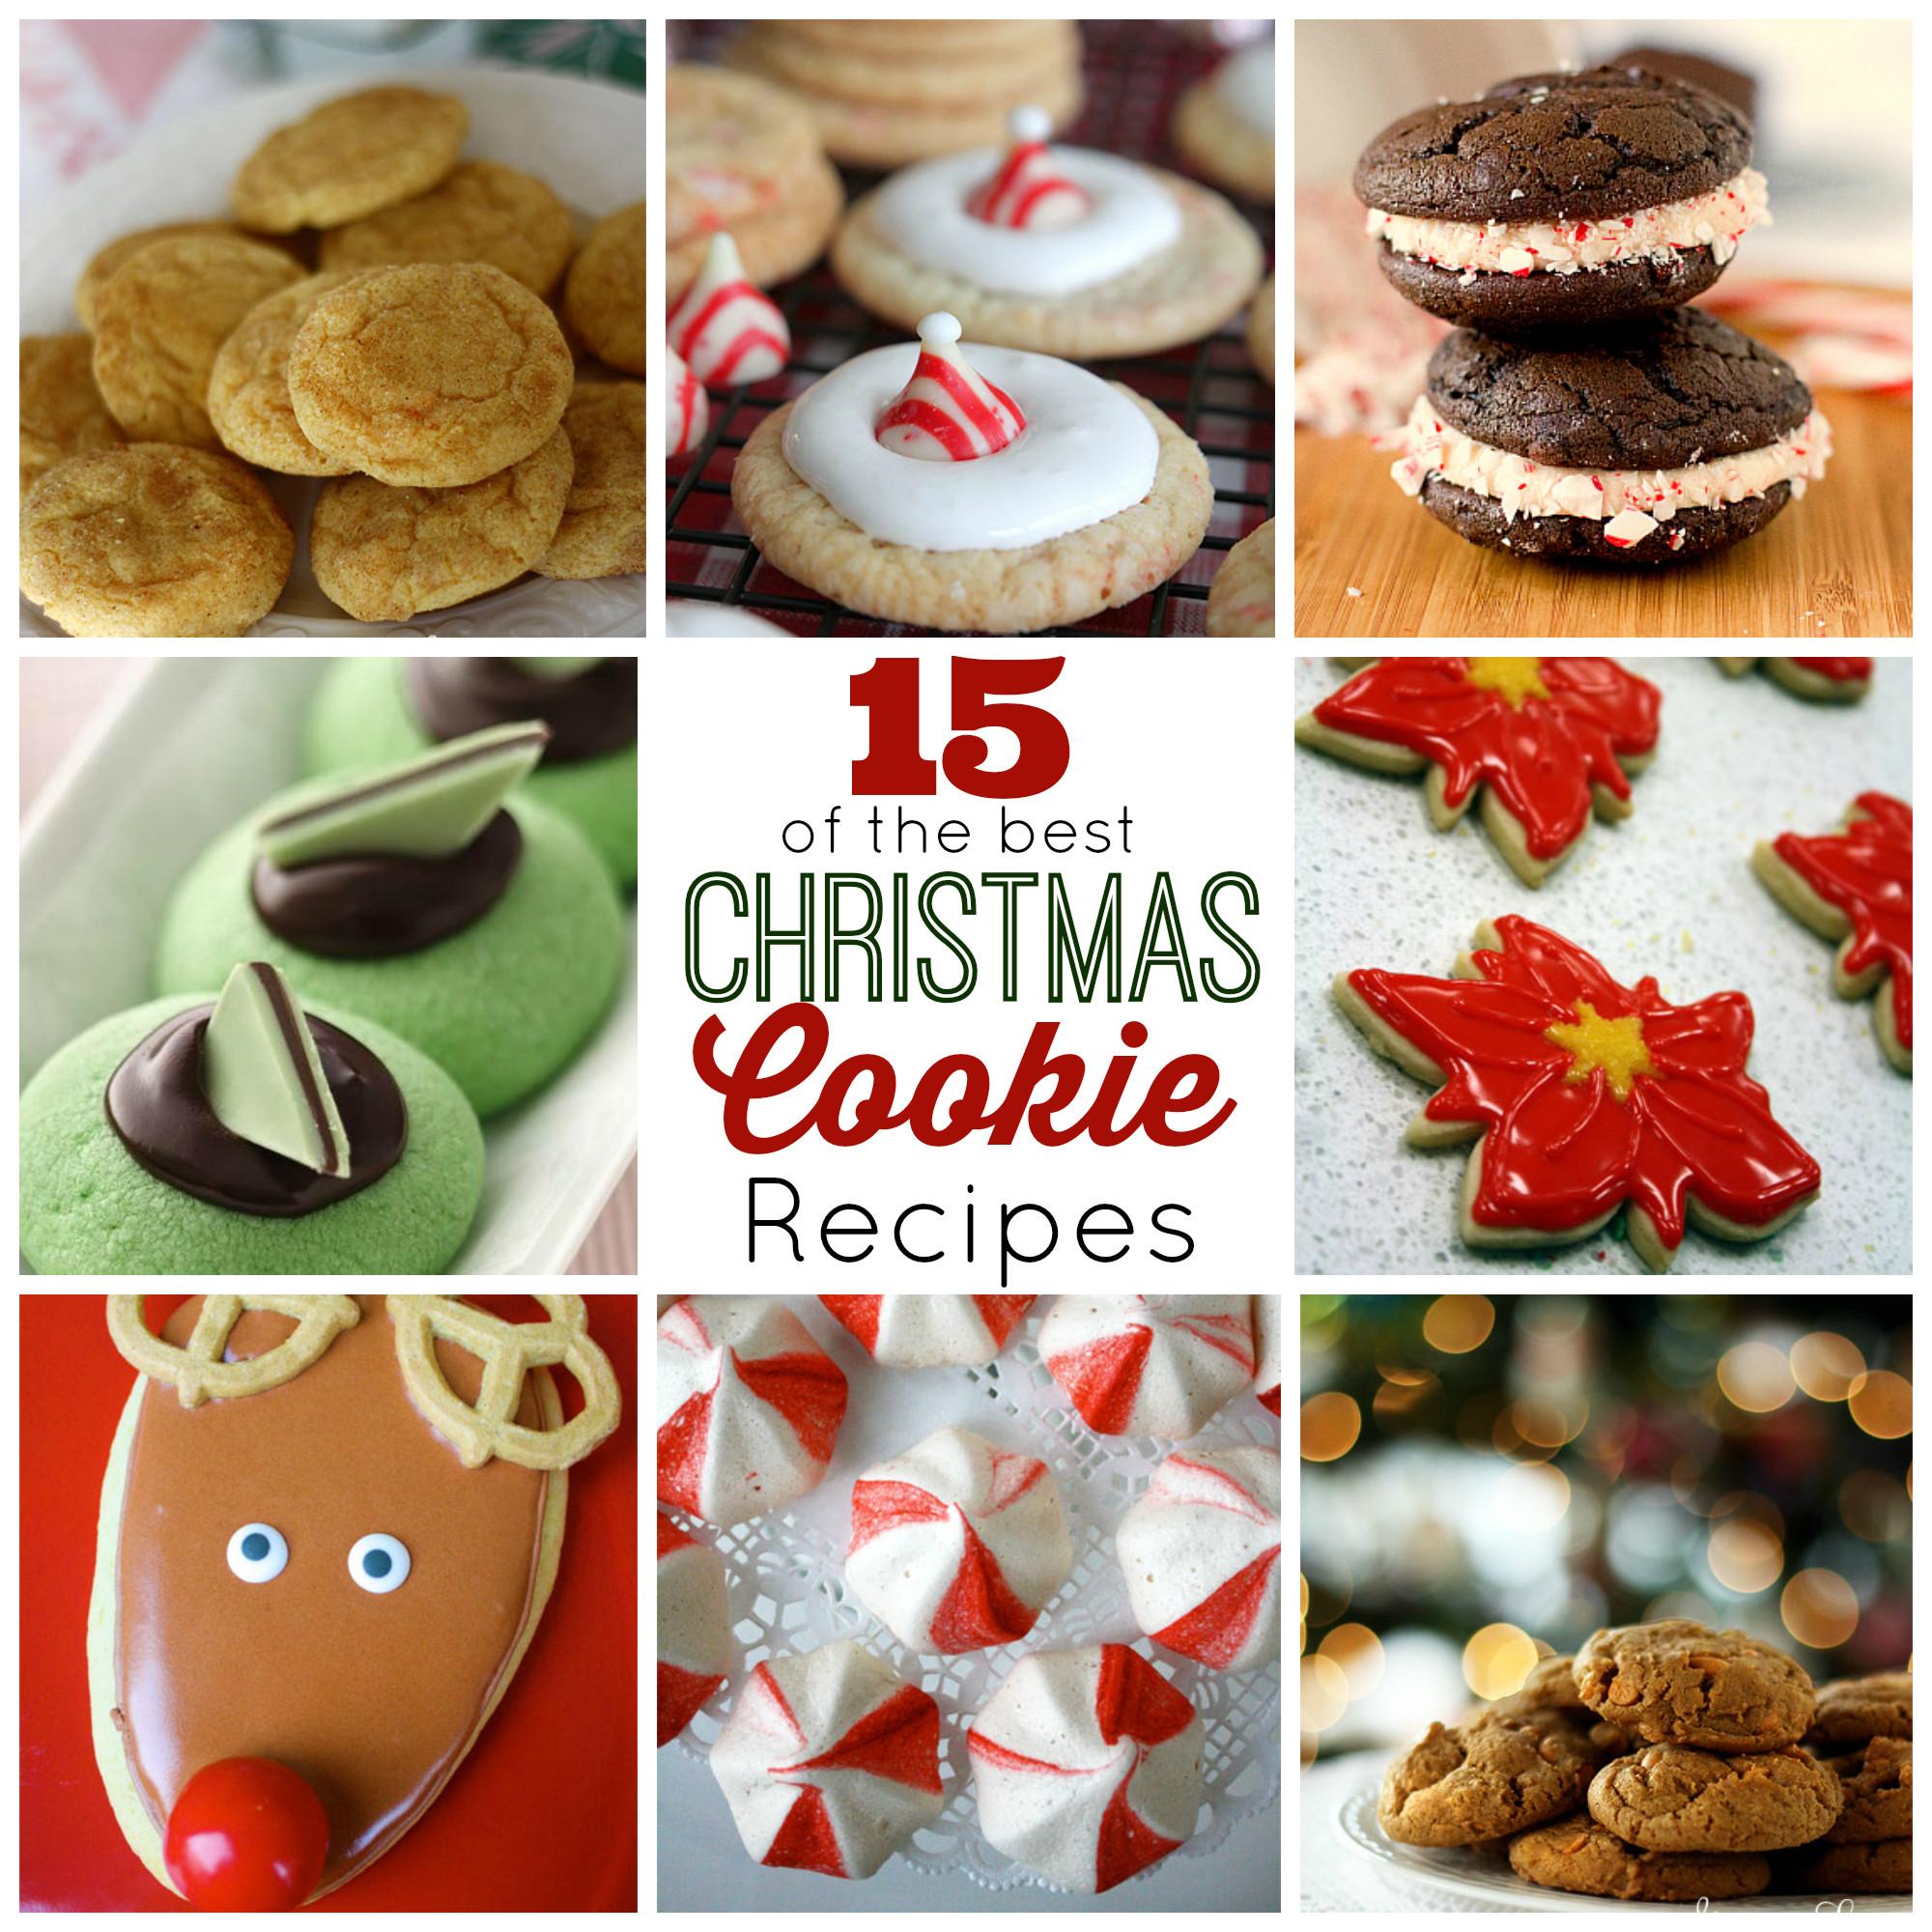 The Best Christmas Cookies  15 of the Best Christmas Cookies